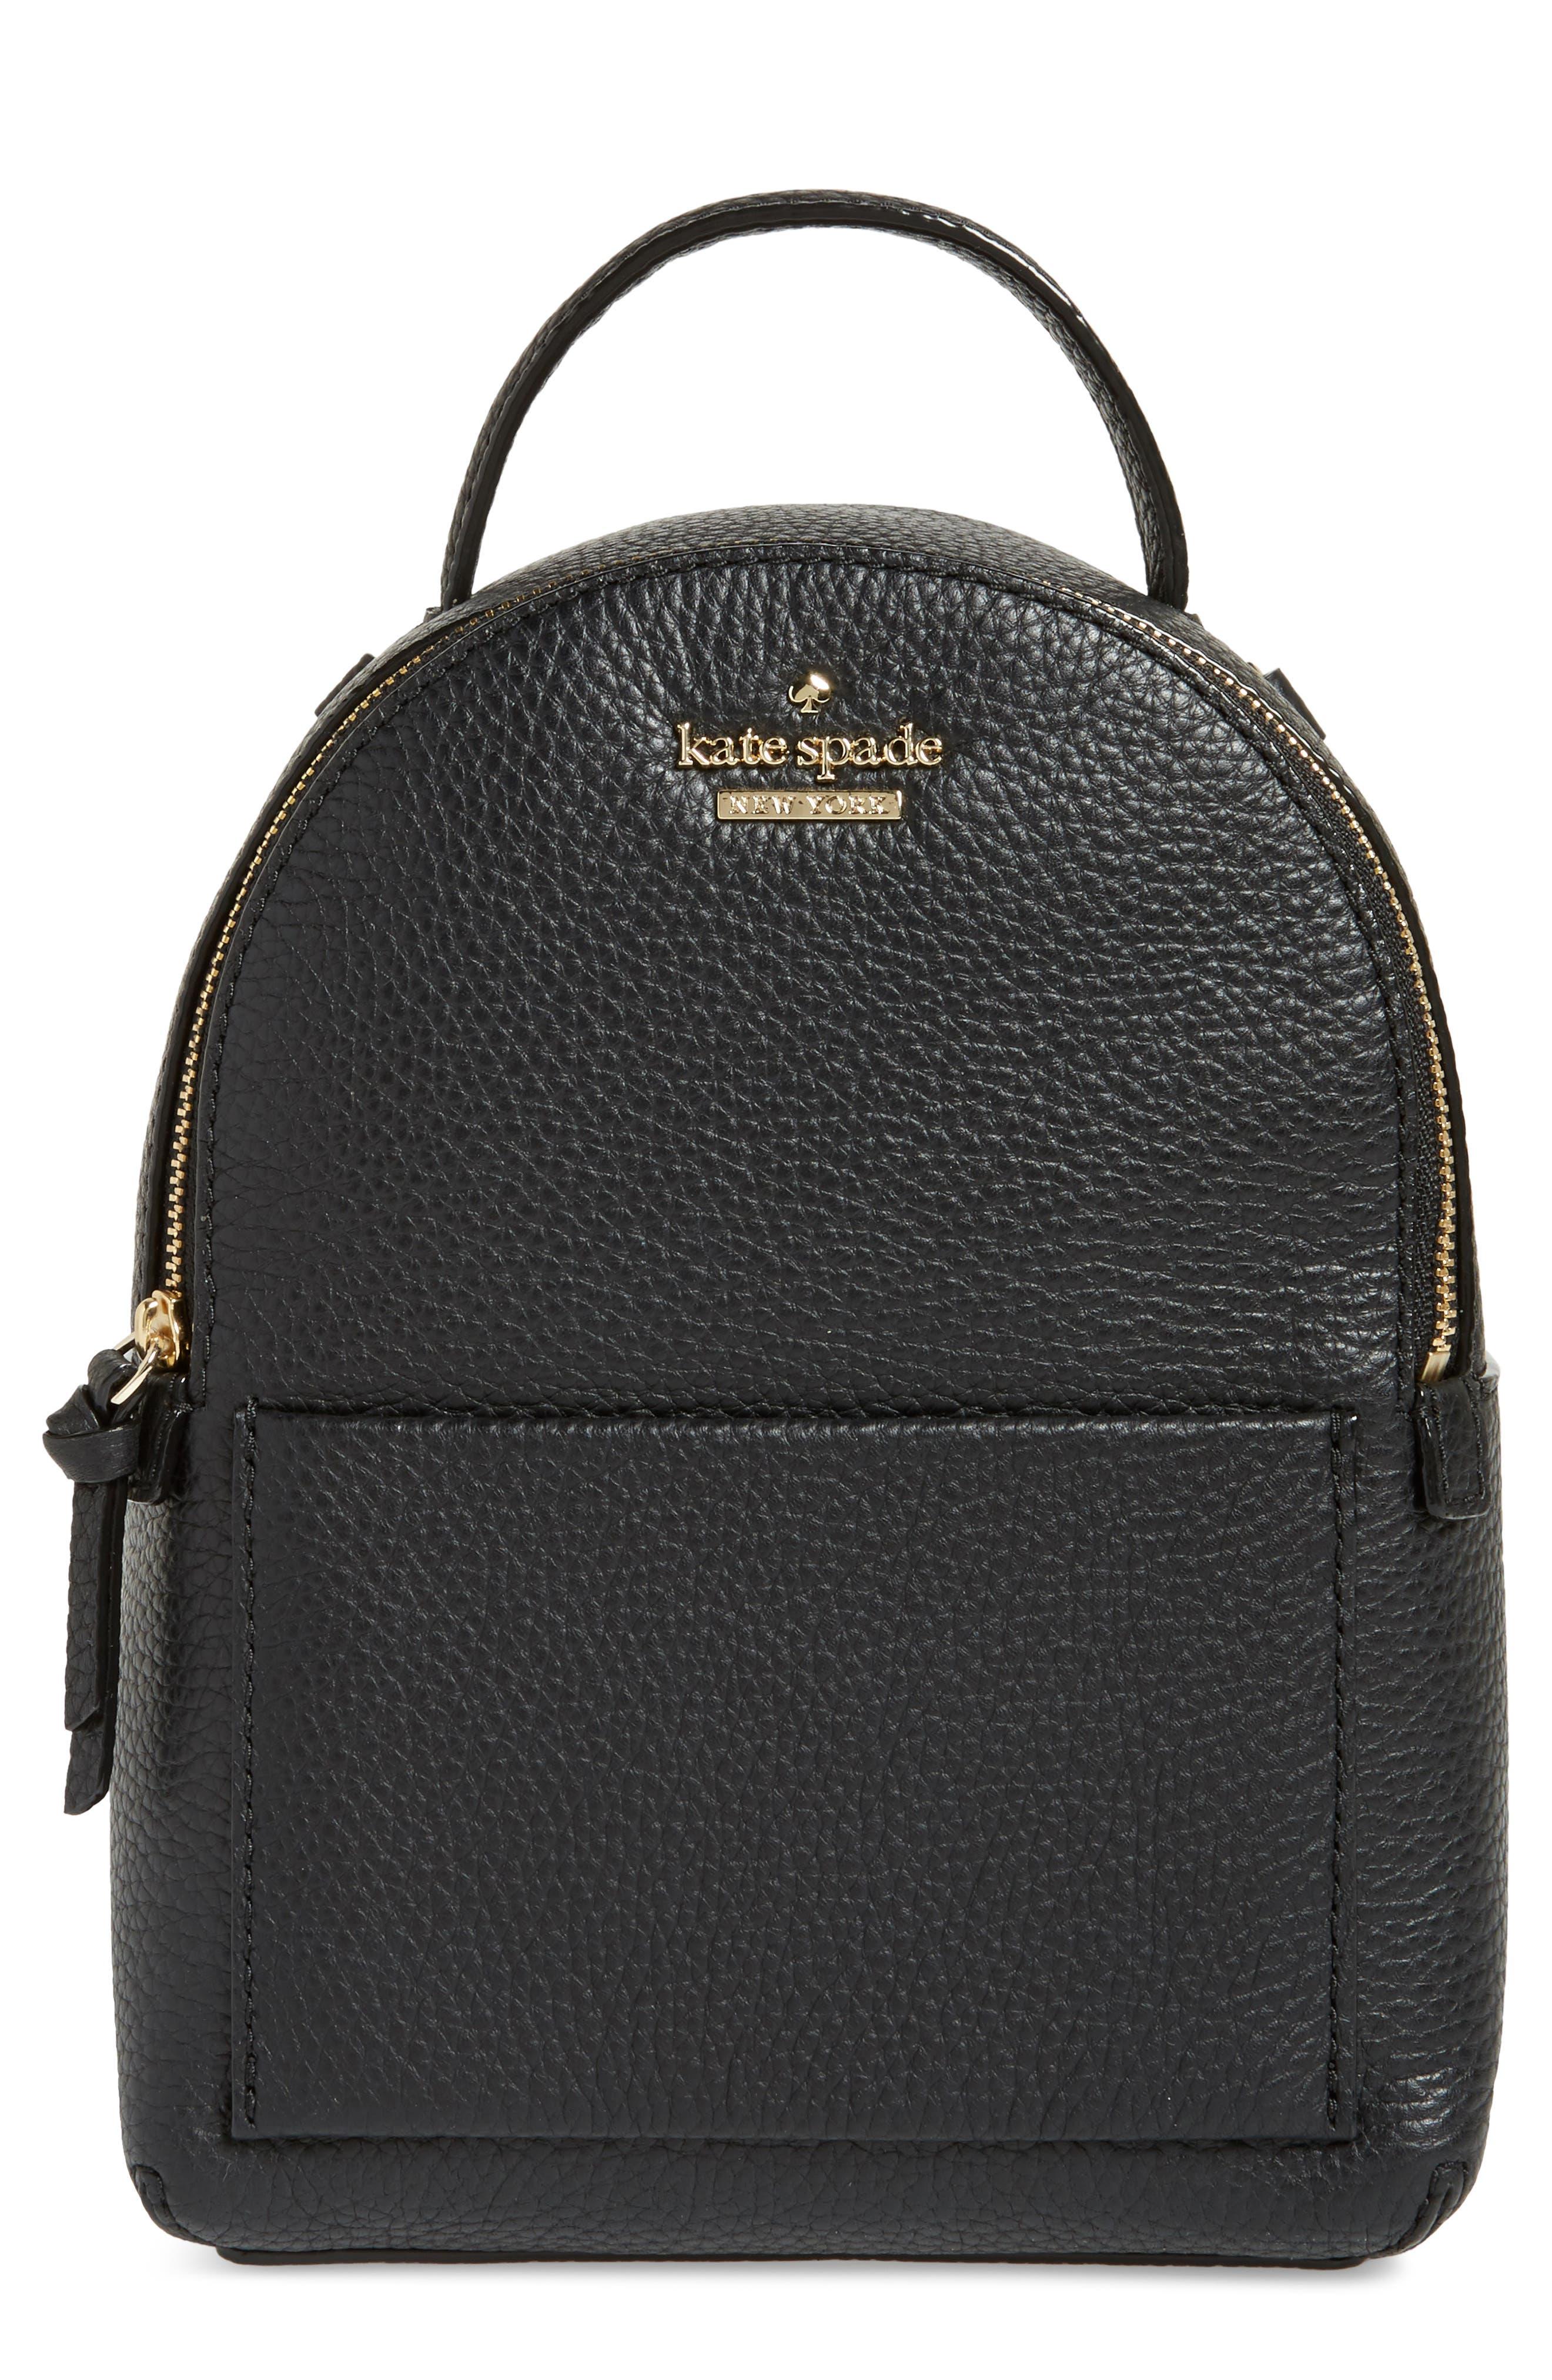 Kate spade new york handbags wallets nordstrom kate spade new york jackson street merry convertible leather backpack junglespirit Gallery